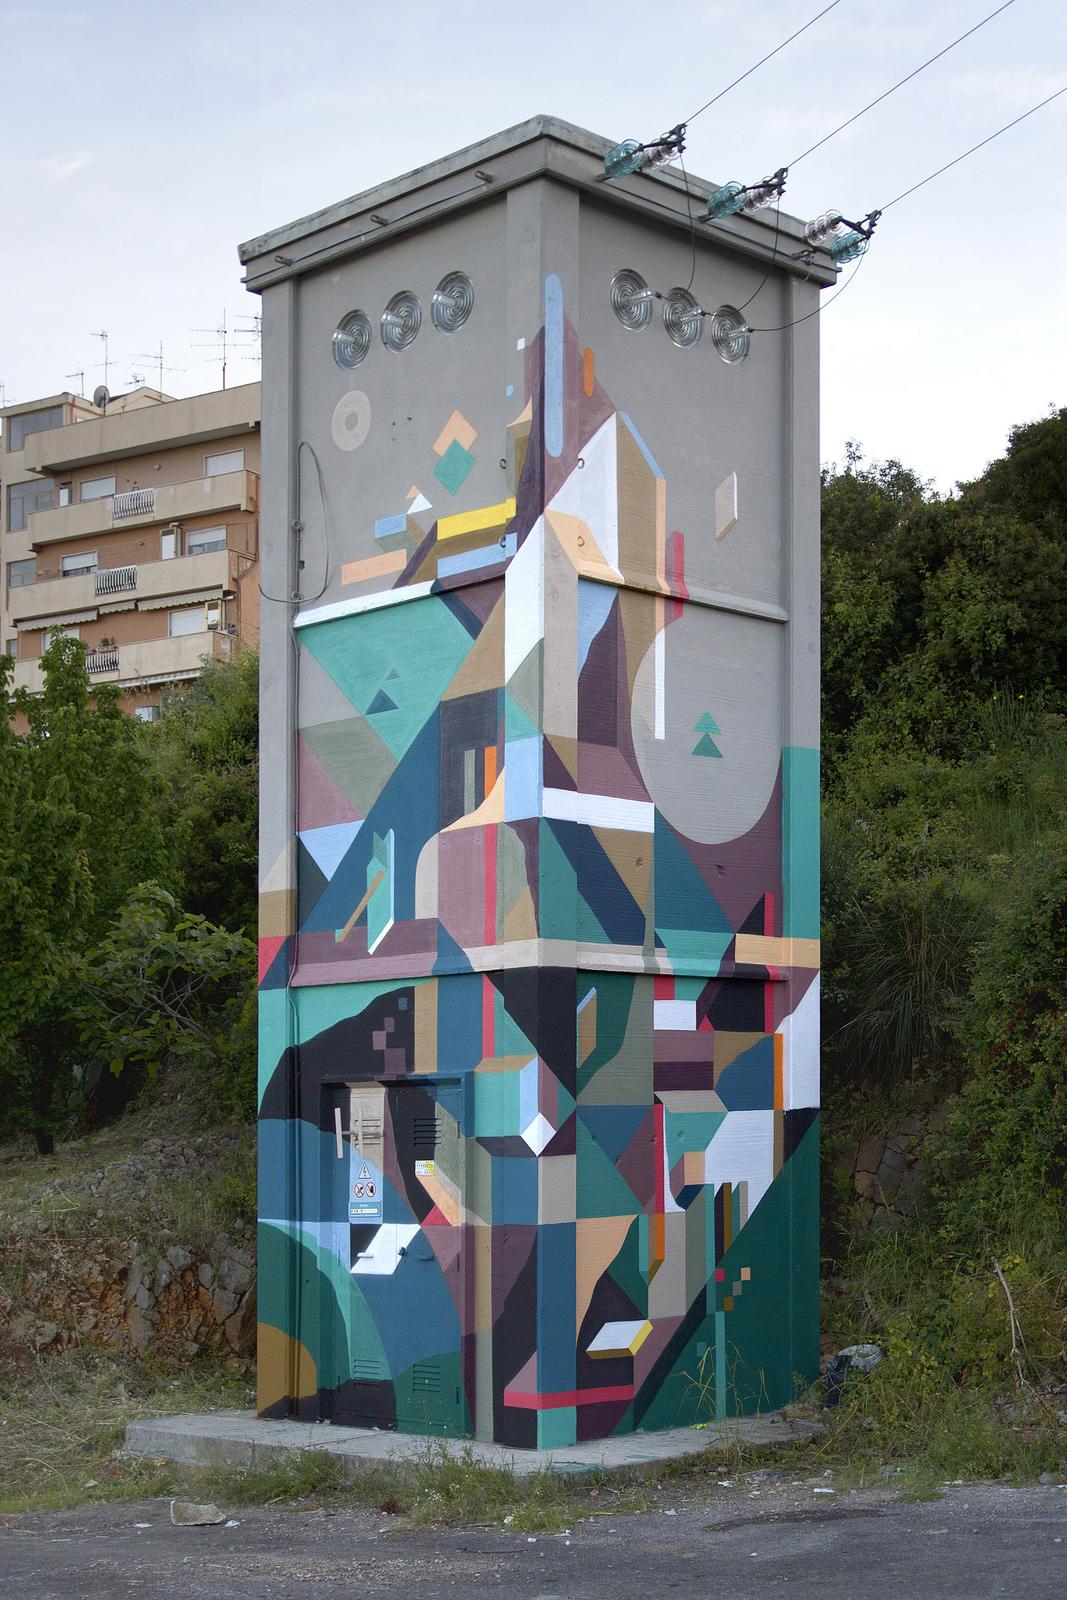 nelio-new-murals-for-memorie-urbane-festival-2014-04